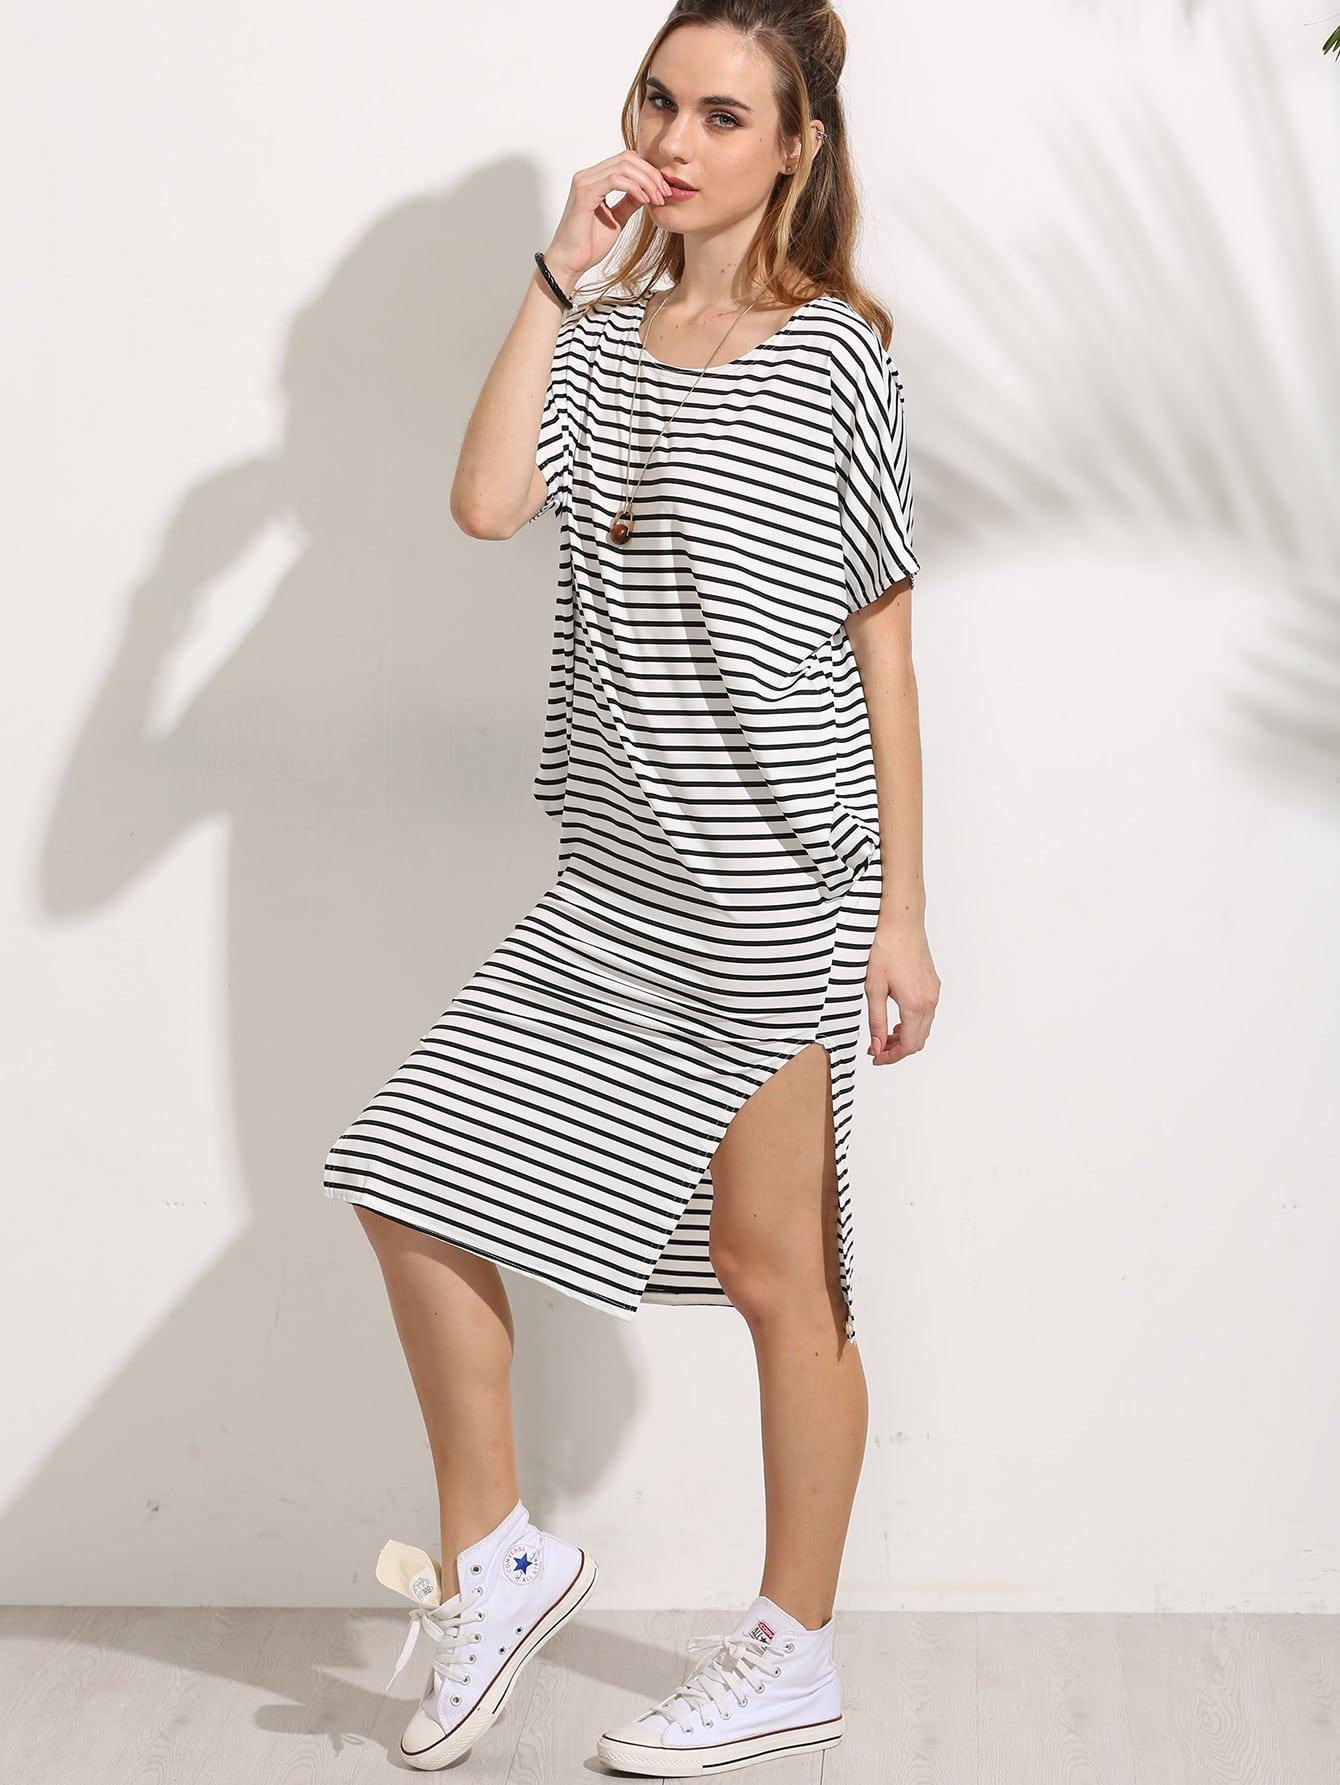 White Striped Side Slit Dress dress160704160